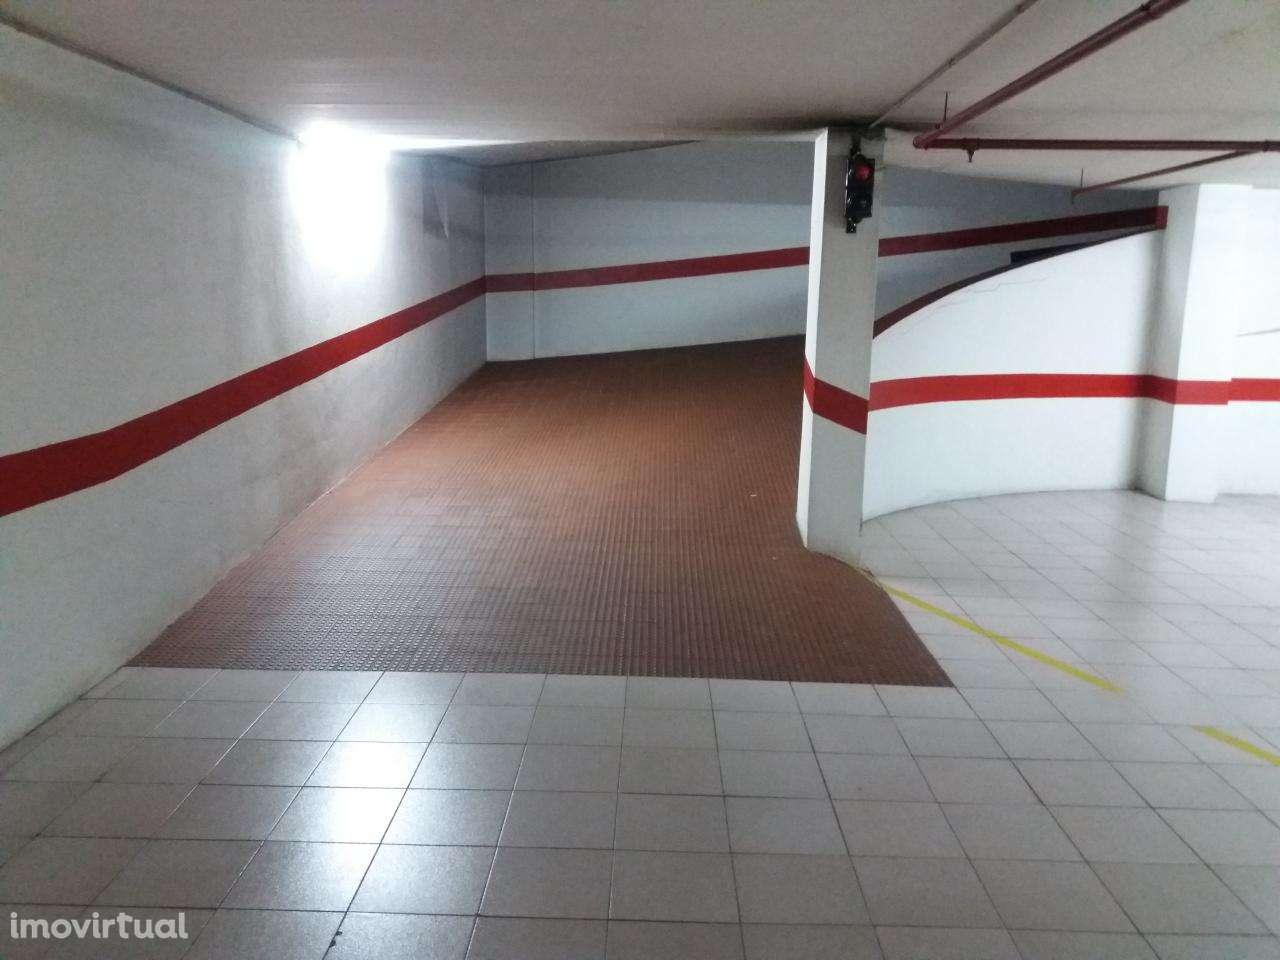 Apartamento para comprar, Areeiro, Lisboa - Foto 35